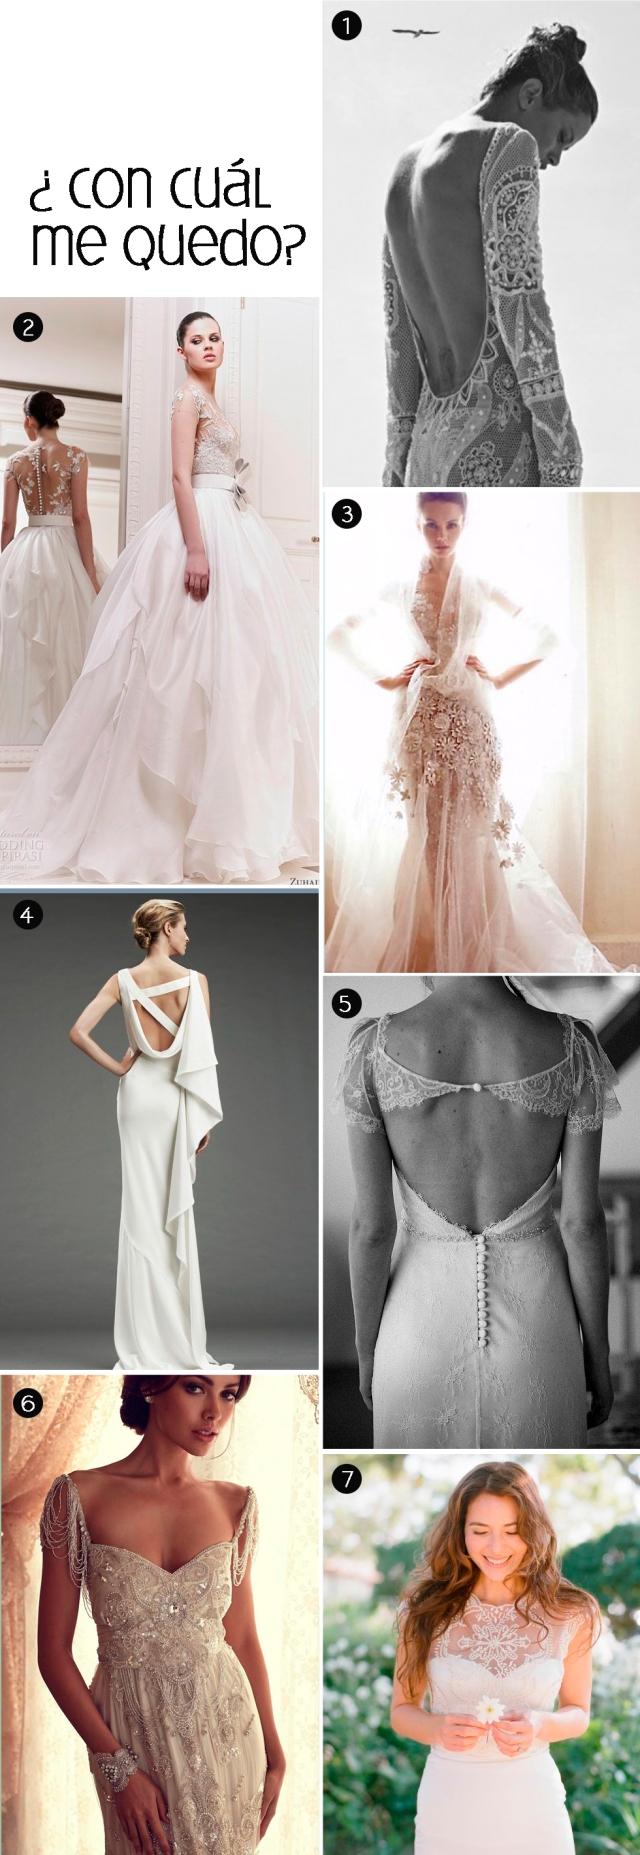 vestidos de novia impresionantes